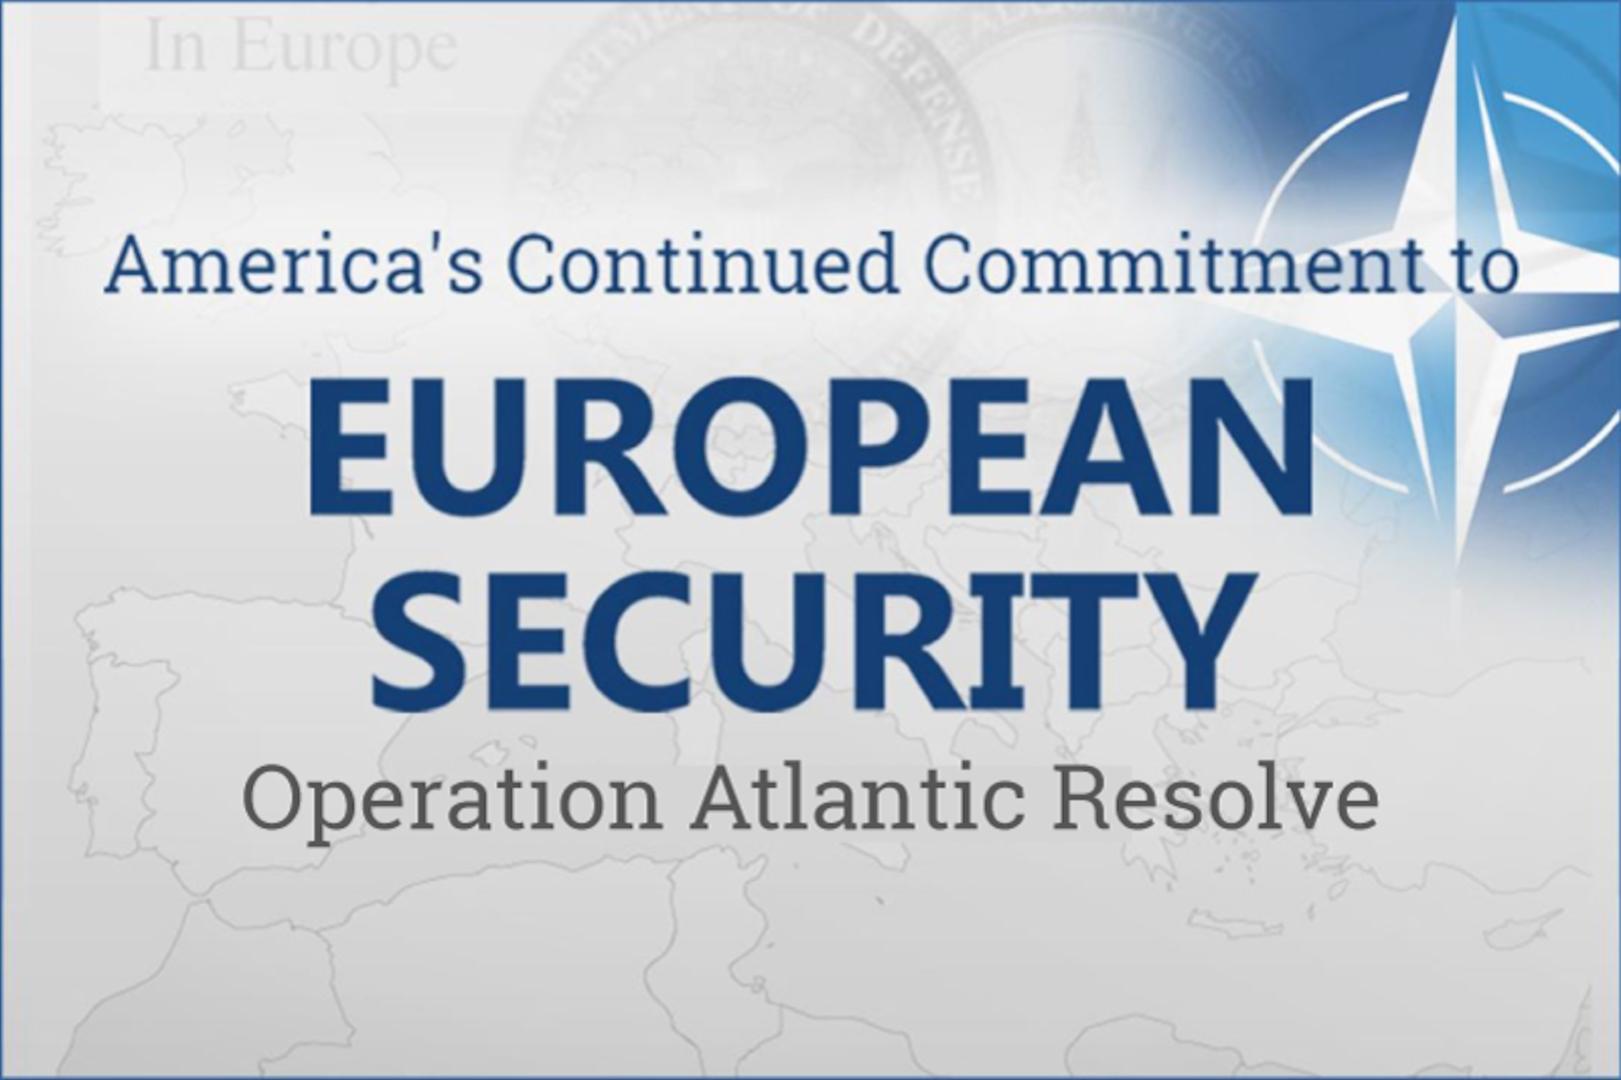 Operation Atlantic Resolve